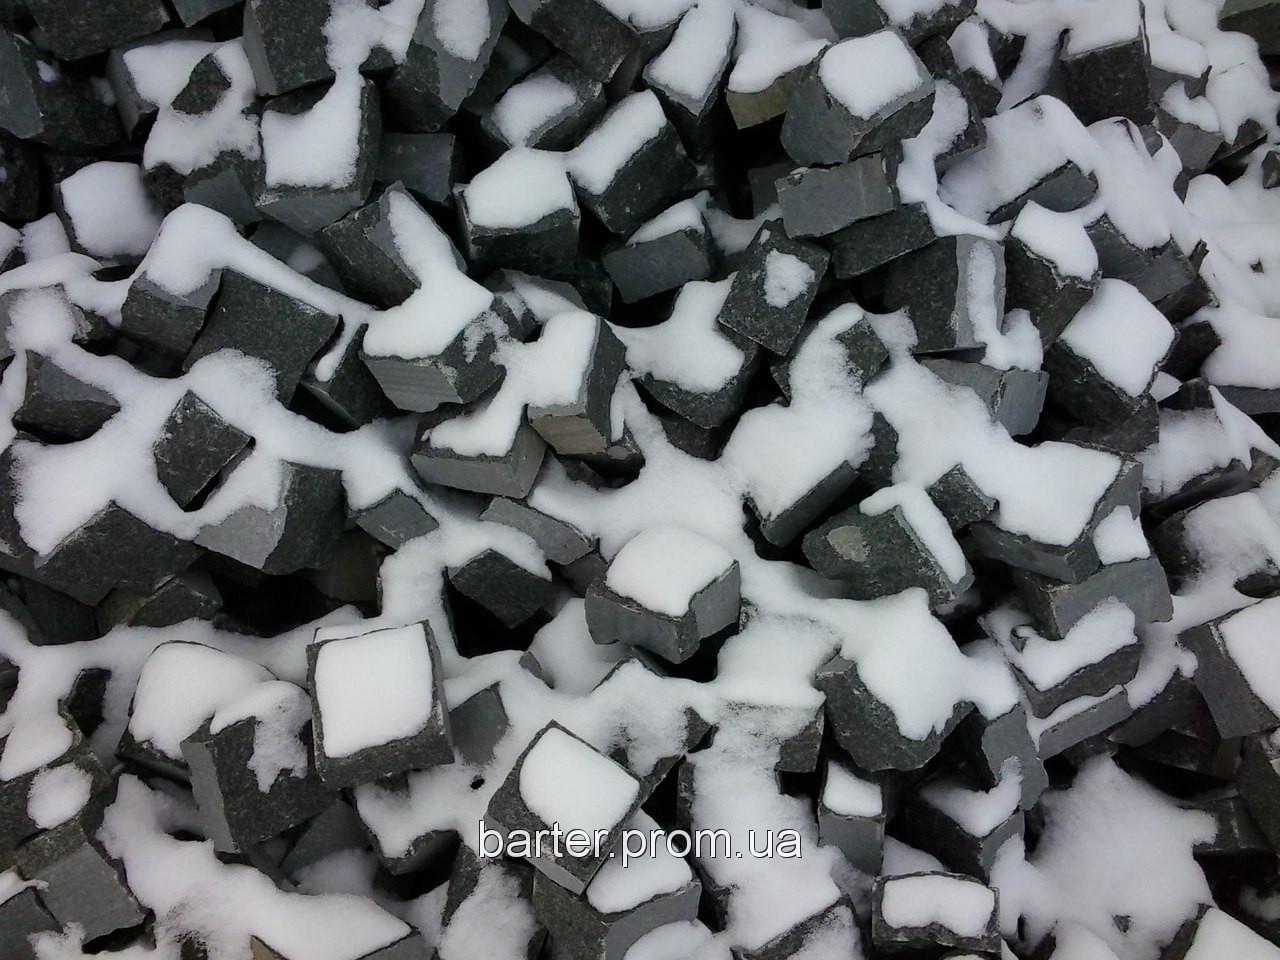 Производство брусчатки гранитной габбро цена